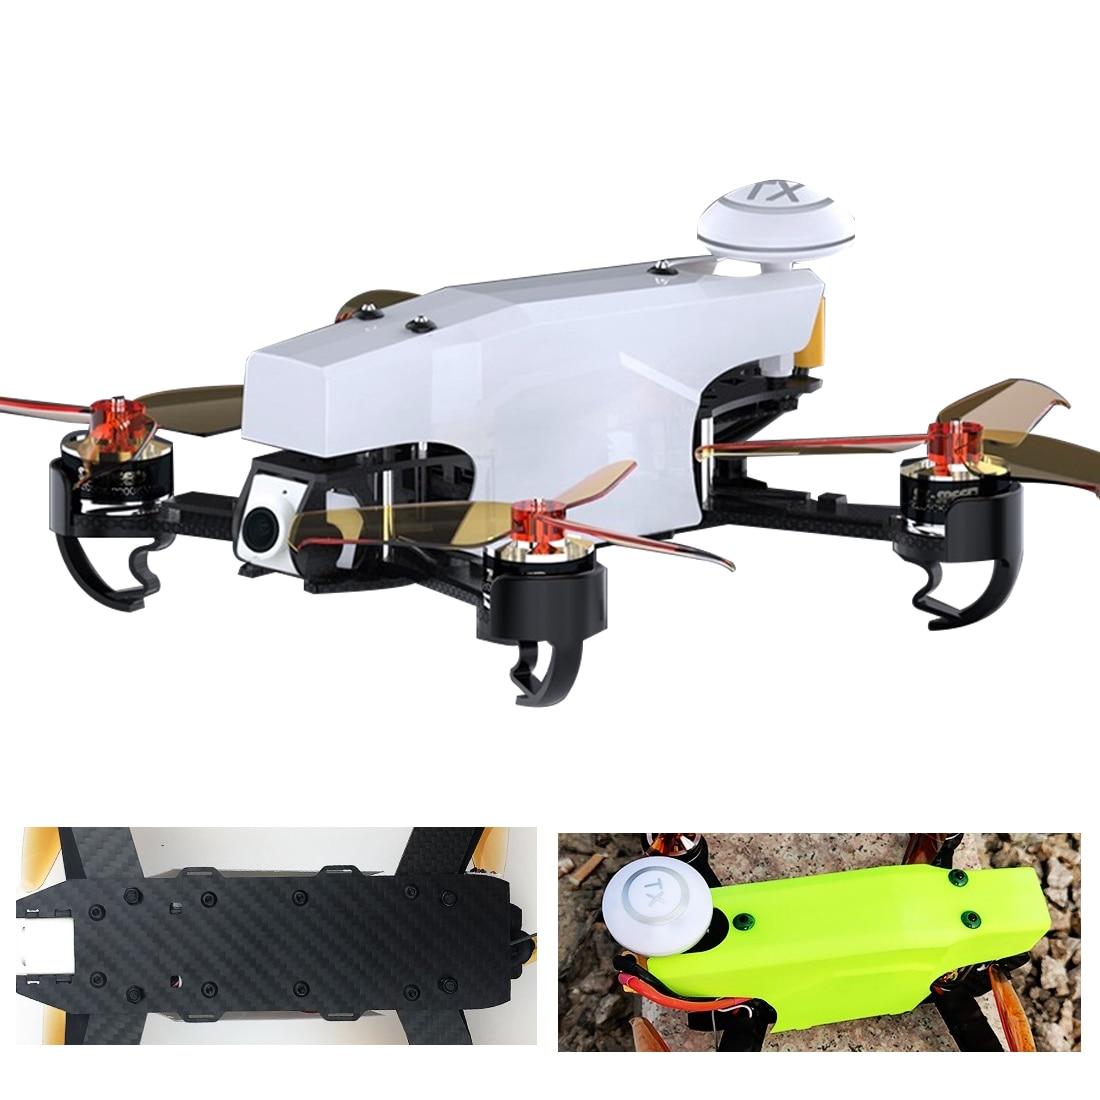 RC Racer Drone GPS 720p-Camera Mini Brushless OSD FPV 210 Flight High-Speed 10mins DVR